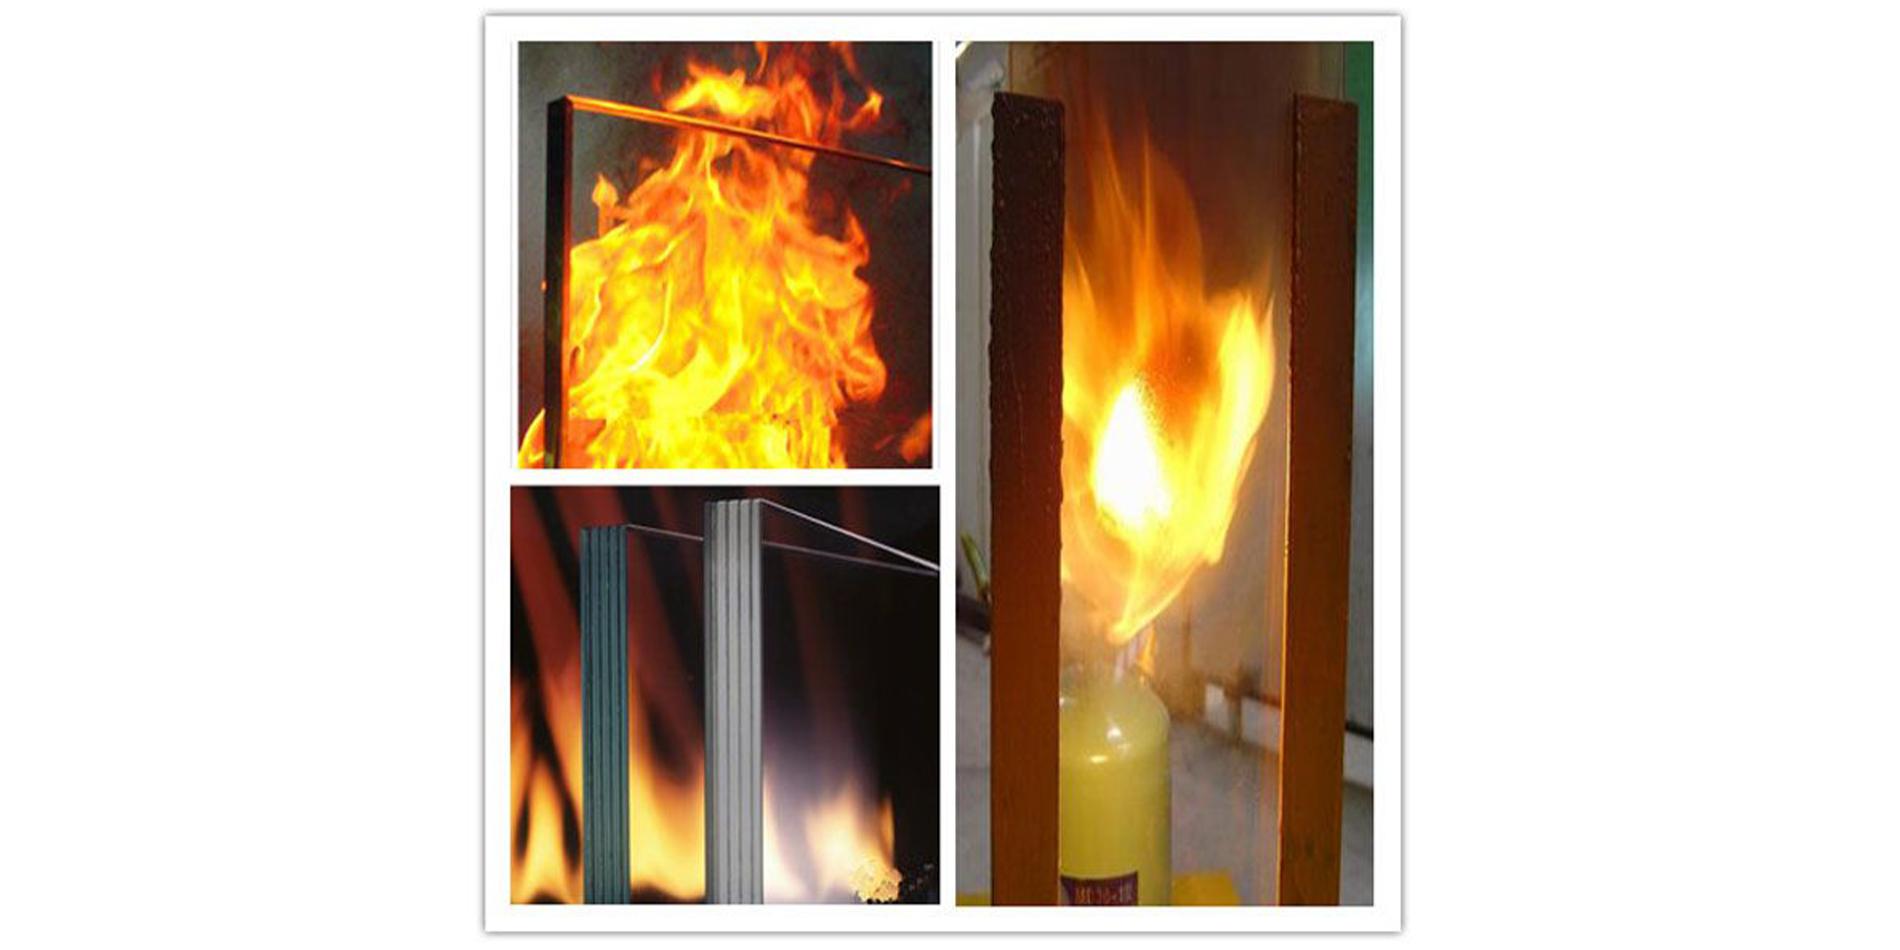 Kính ngăn cháy